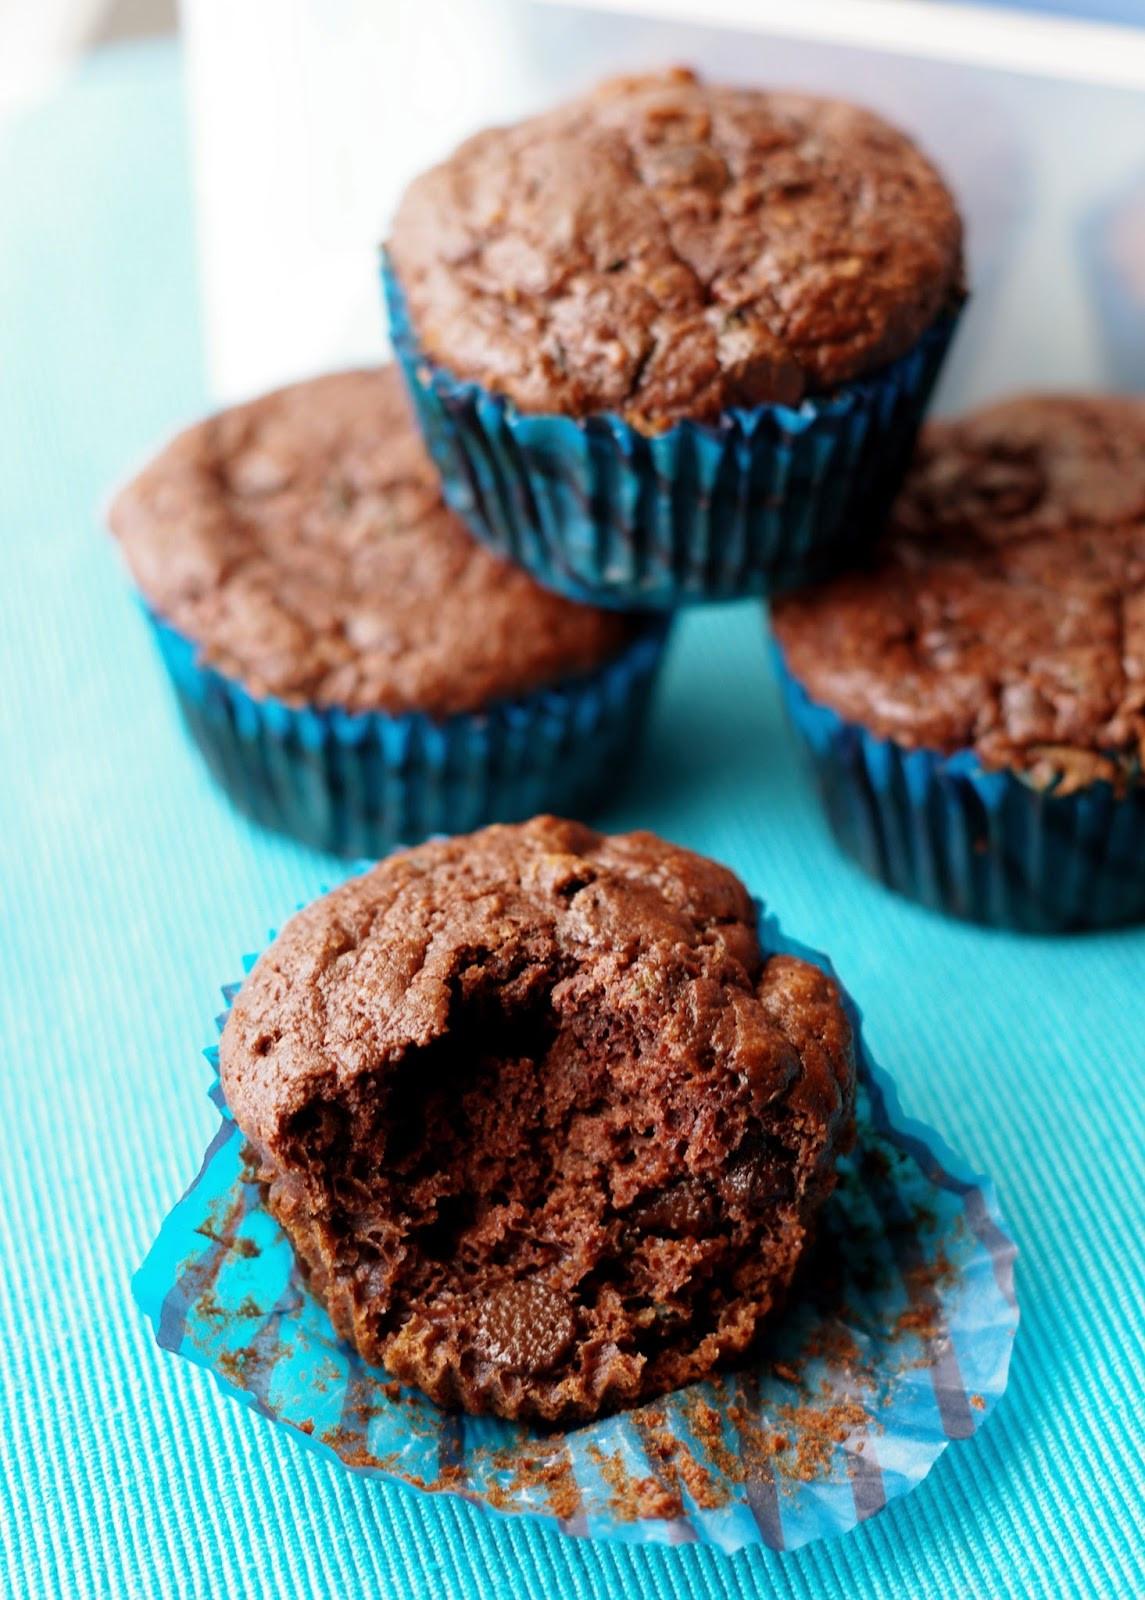 Zucchini Muffins Healthy  the nOATbook Healthy Chocolate Chip Zucchini Muffins